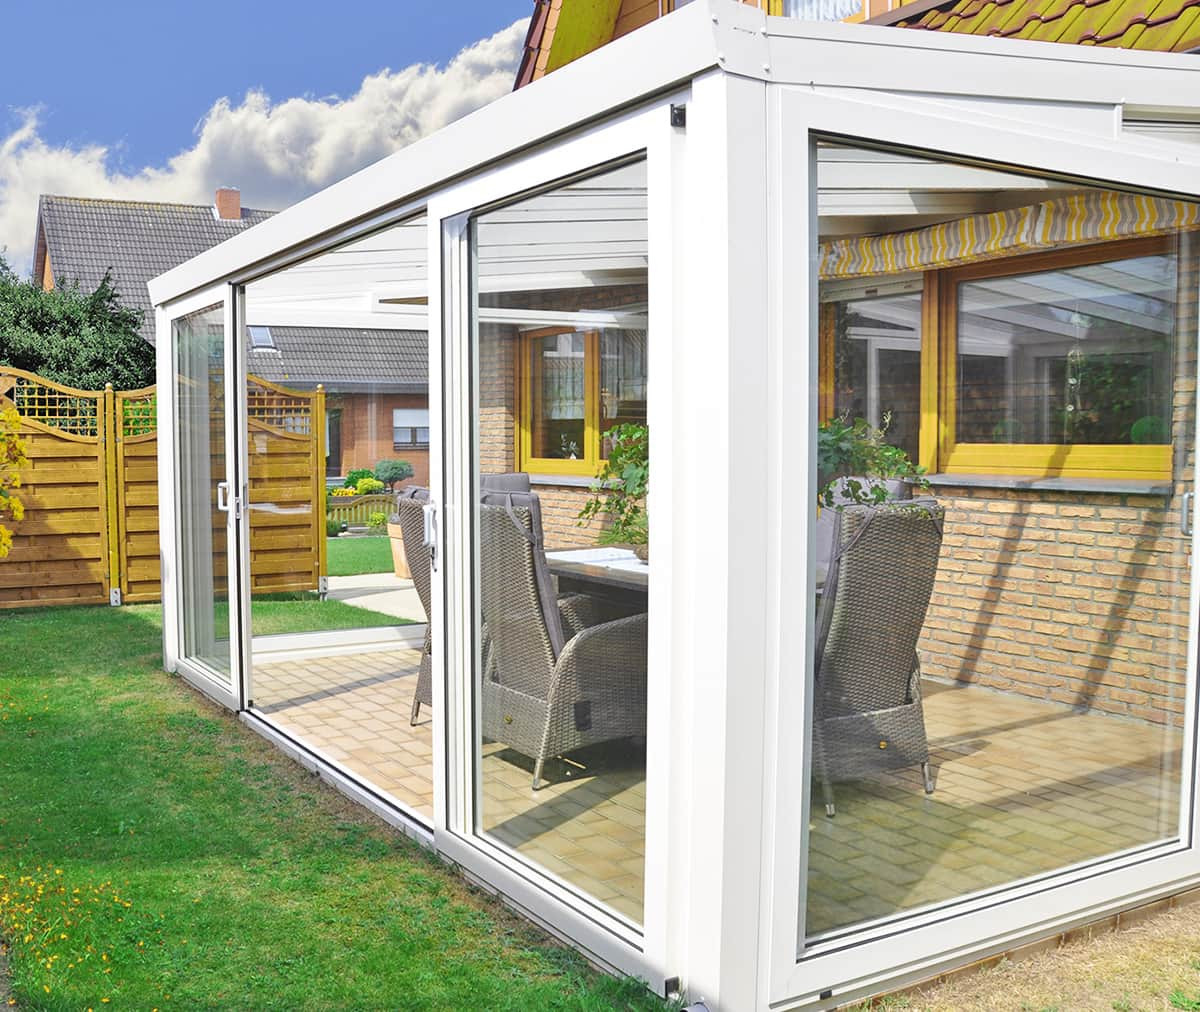 Véranda aluminium toiture verre VISION (Double-porte coulissante)